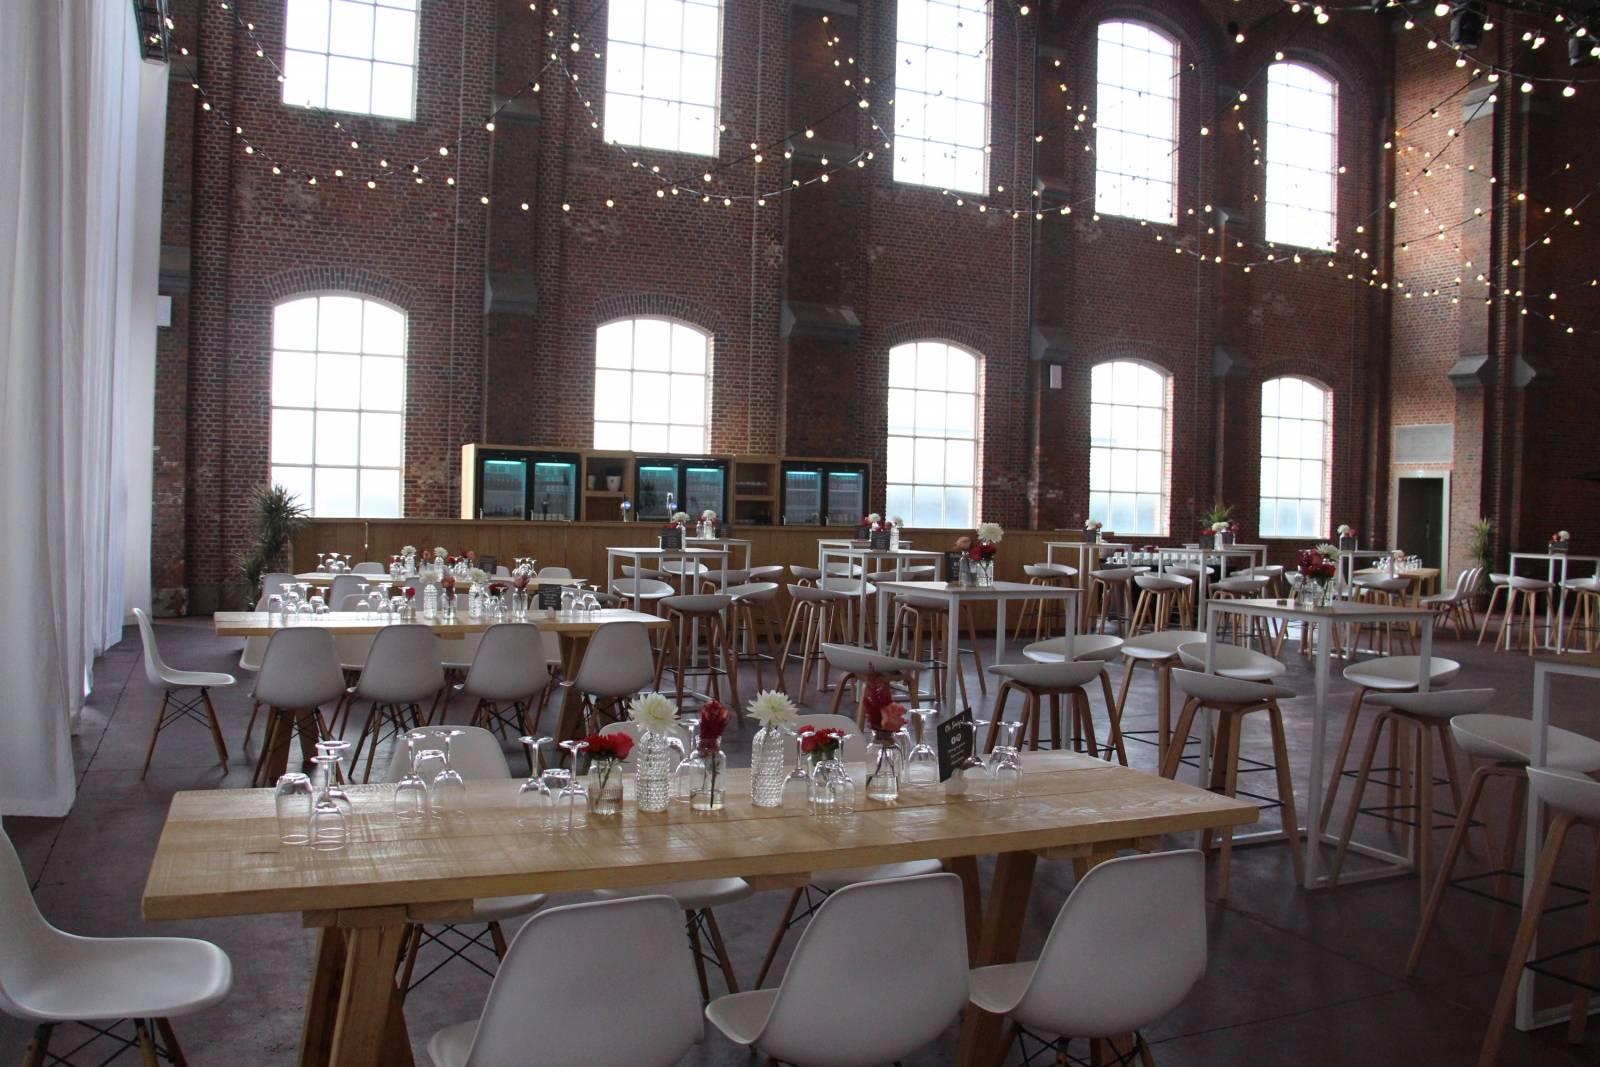 Hangar 43 - Feestzaal Oost-Vlaanderen - Industrieel - House of Weddings - 32